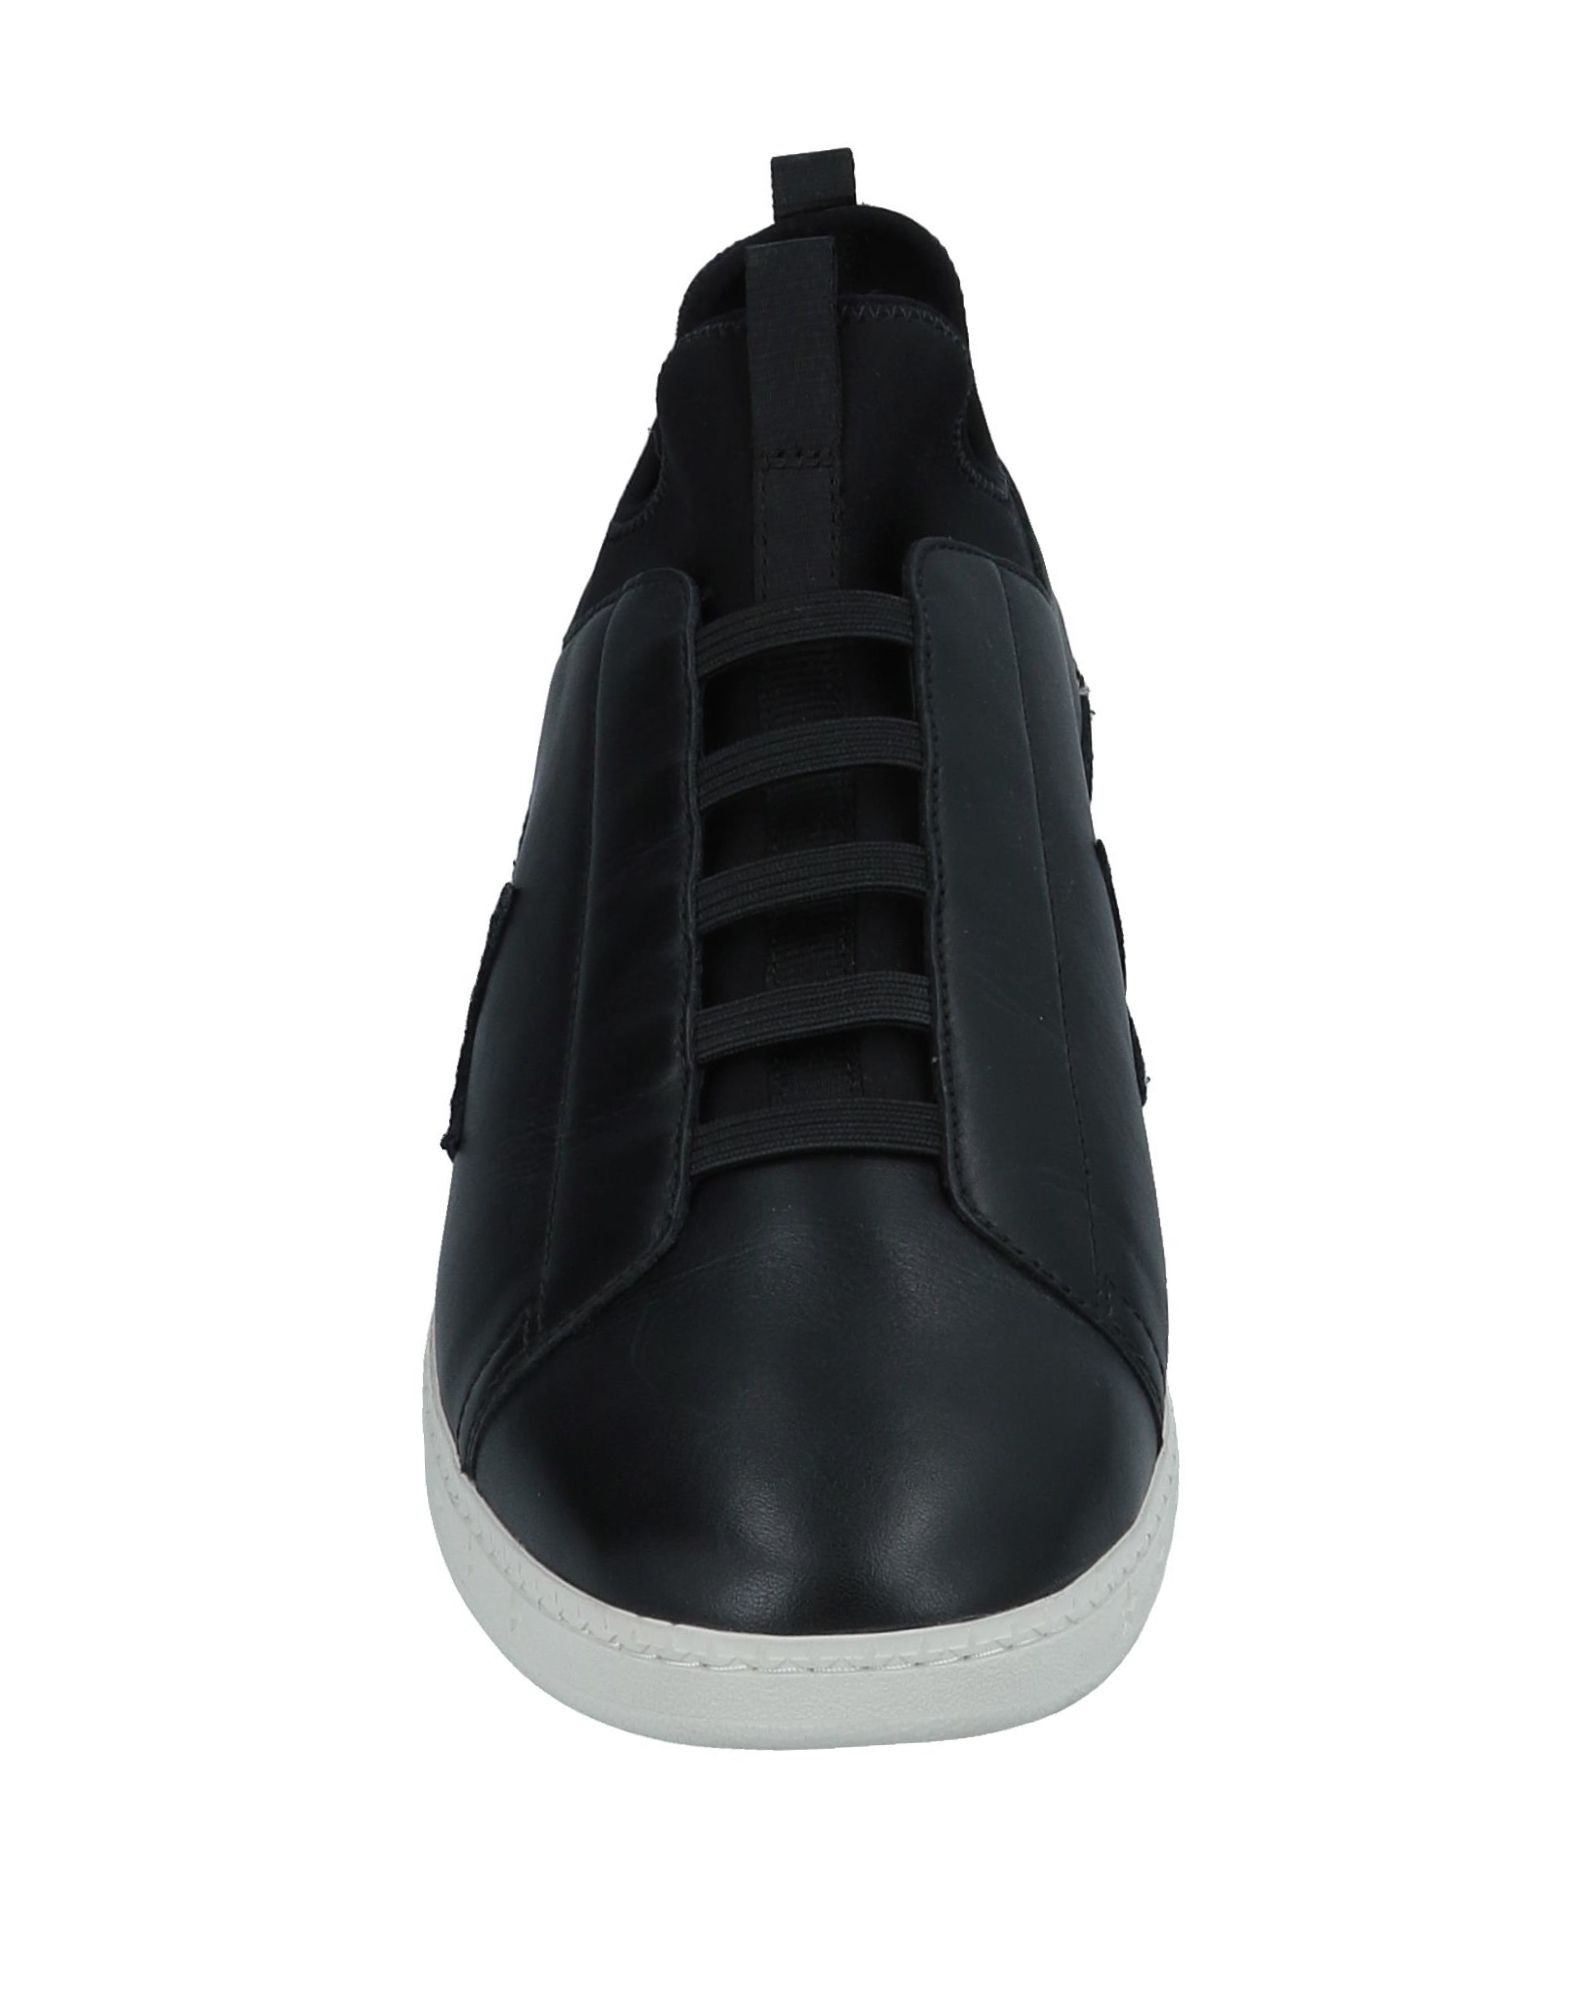 Rabatt echte Schuhe Herren Ash Sneakers Herren Schuhe  11567195WK cf38f5